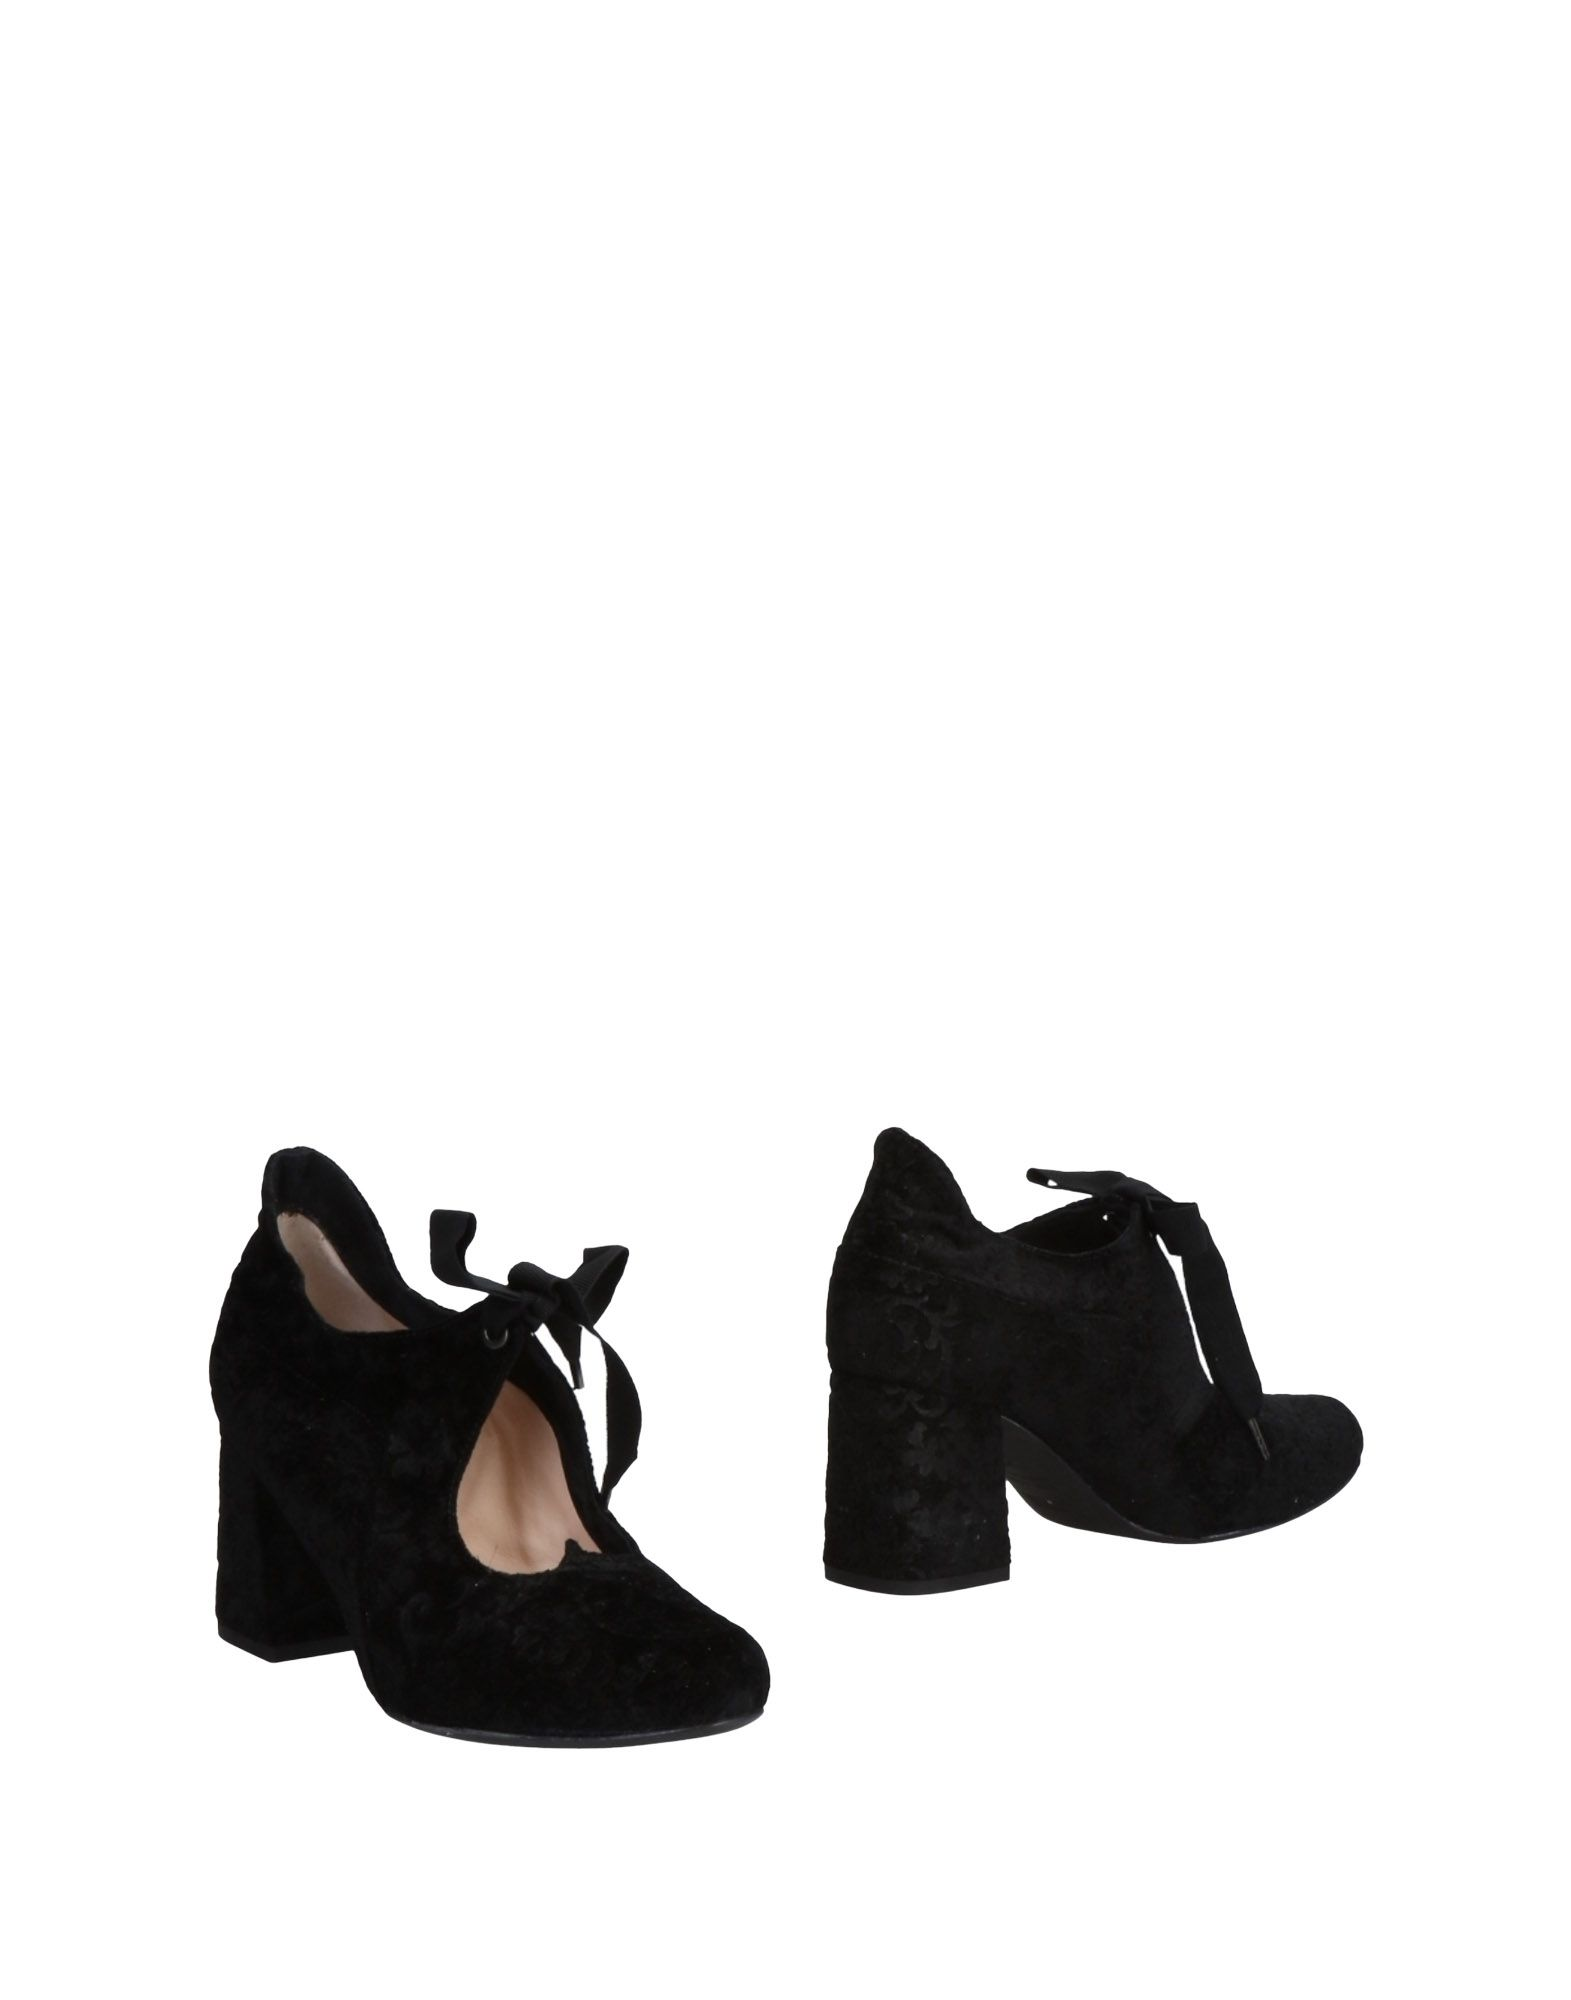 Mina Buenos Aires Stiefelette Damen Damen Damen  11468420UE Neue Schuhe cd07e8